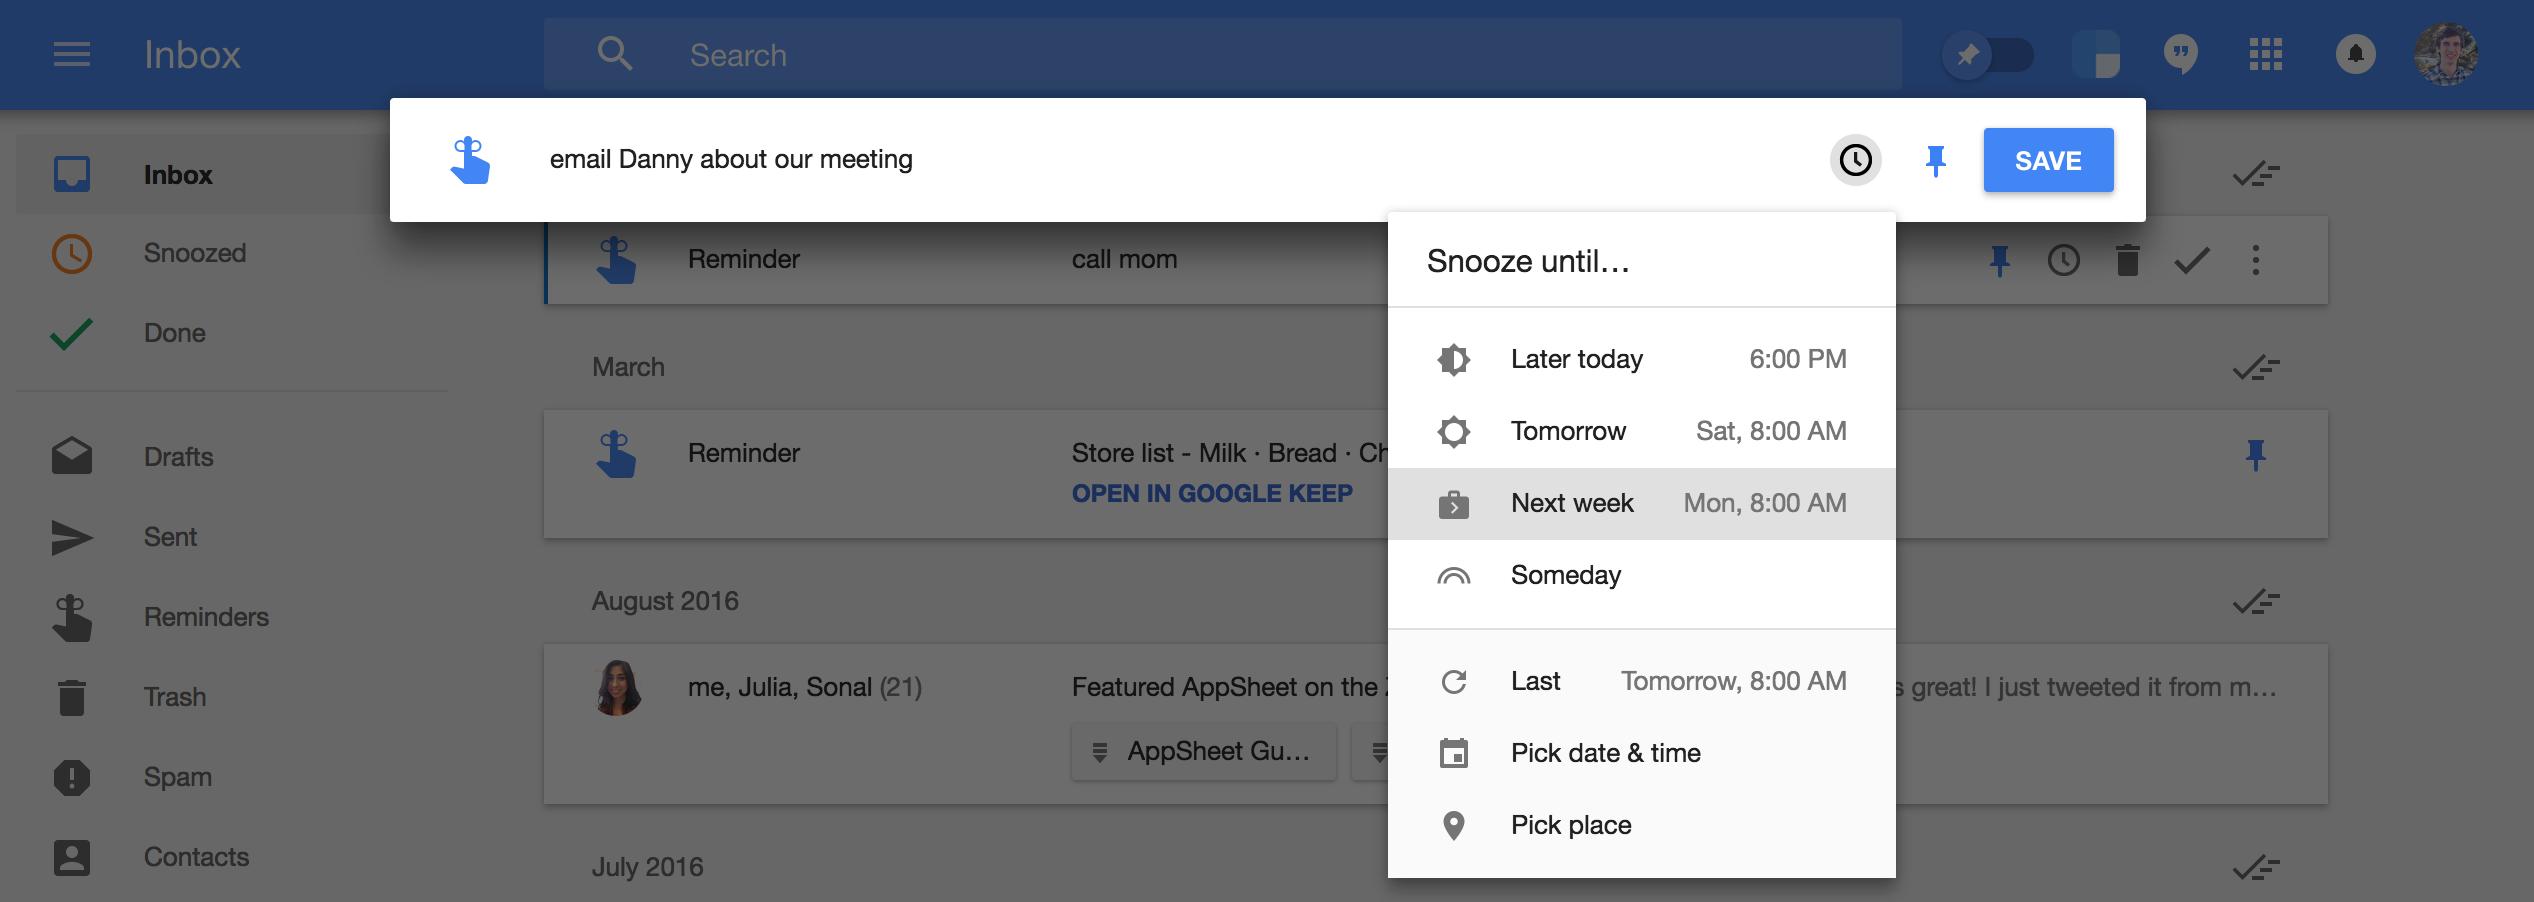 Google Inbox Reminders